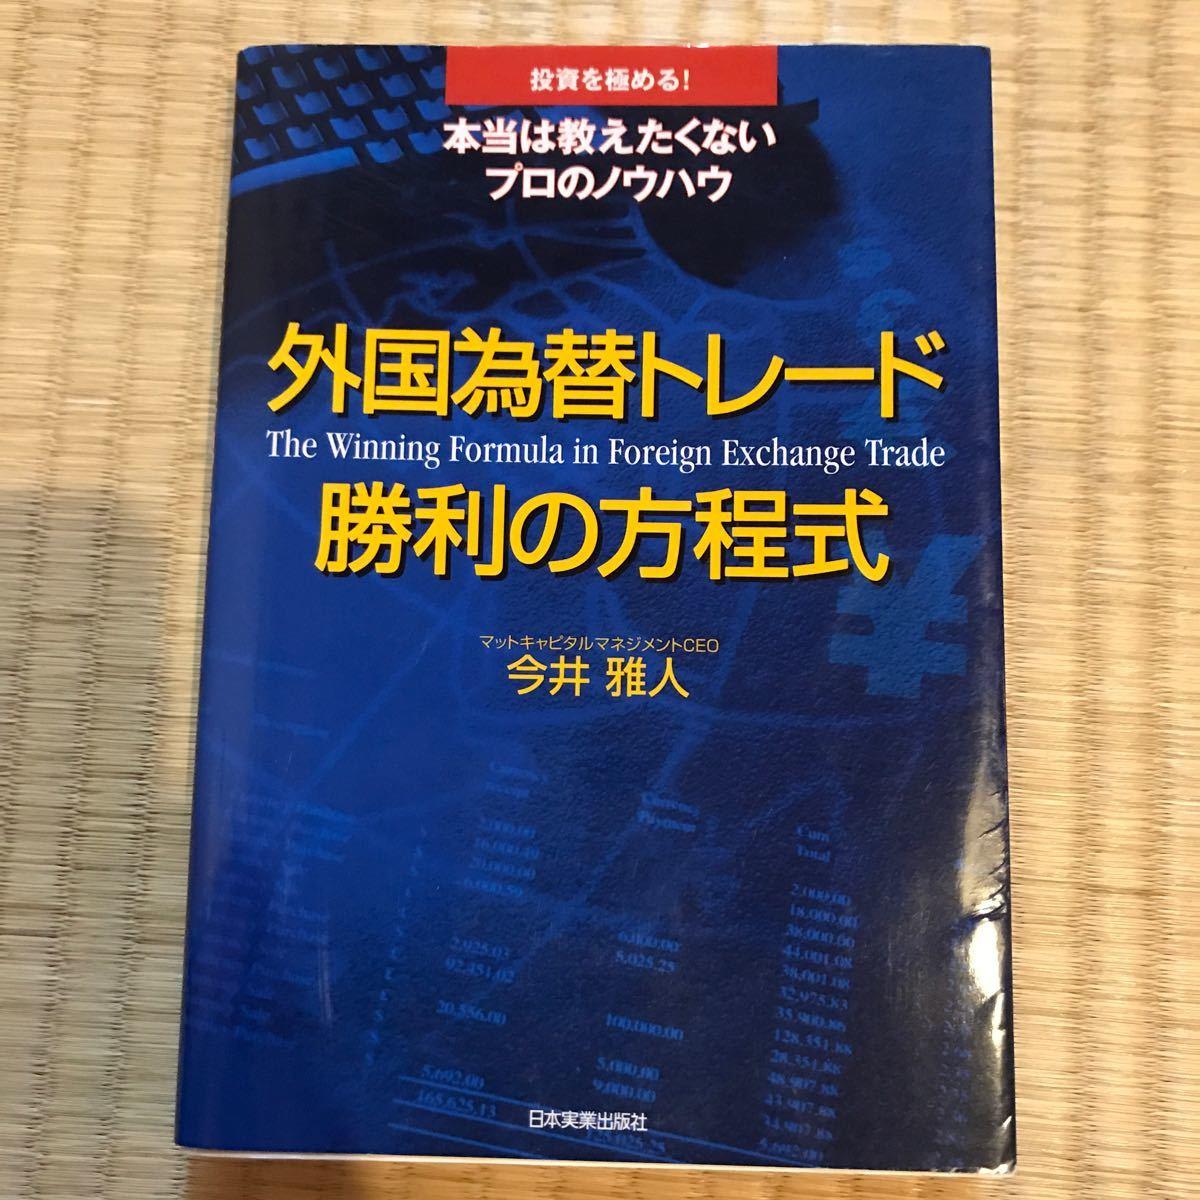 外国為替トレード 勝利の方程式/今井雅人 (著者)